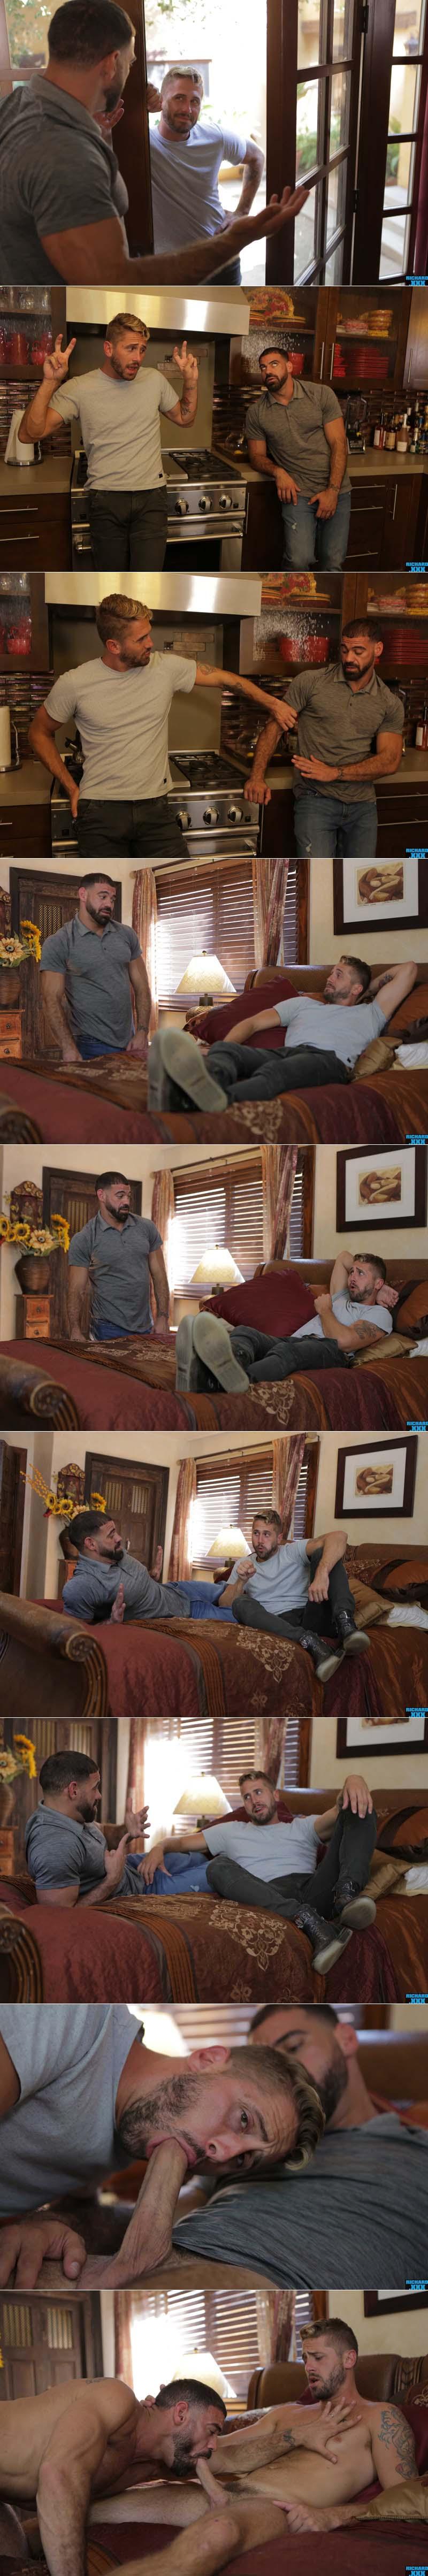 Ricky Larkin Fucks Wesley Woods at Richard.XXX